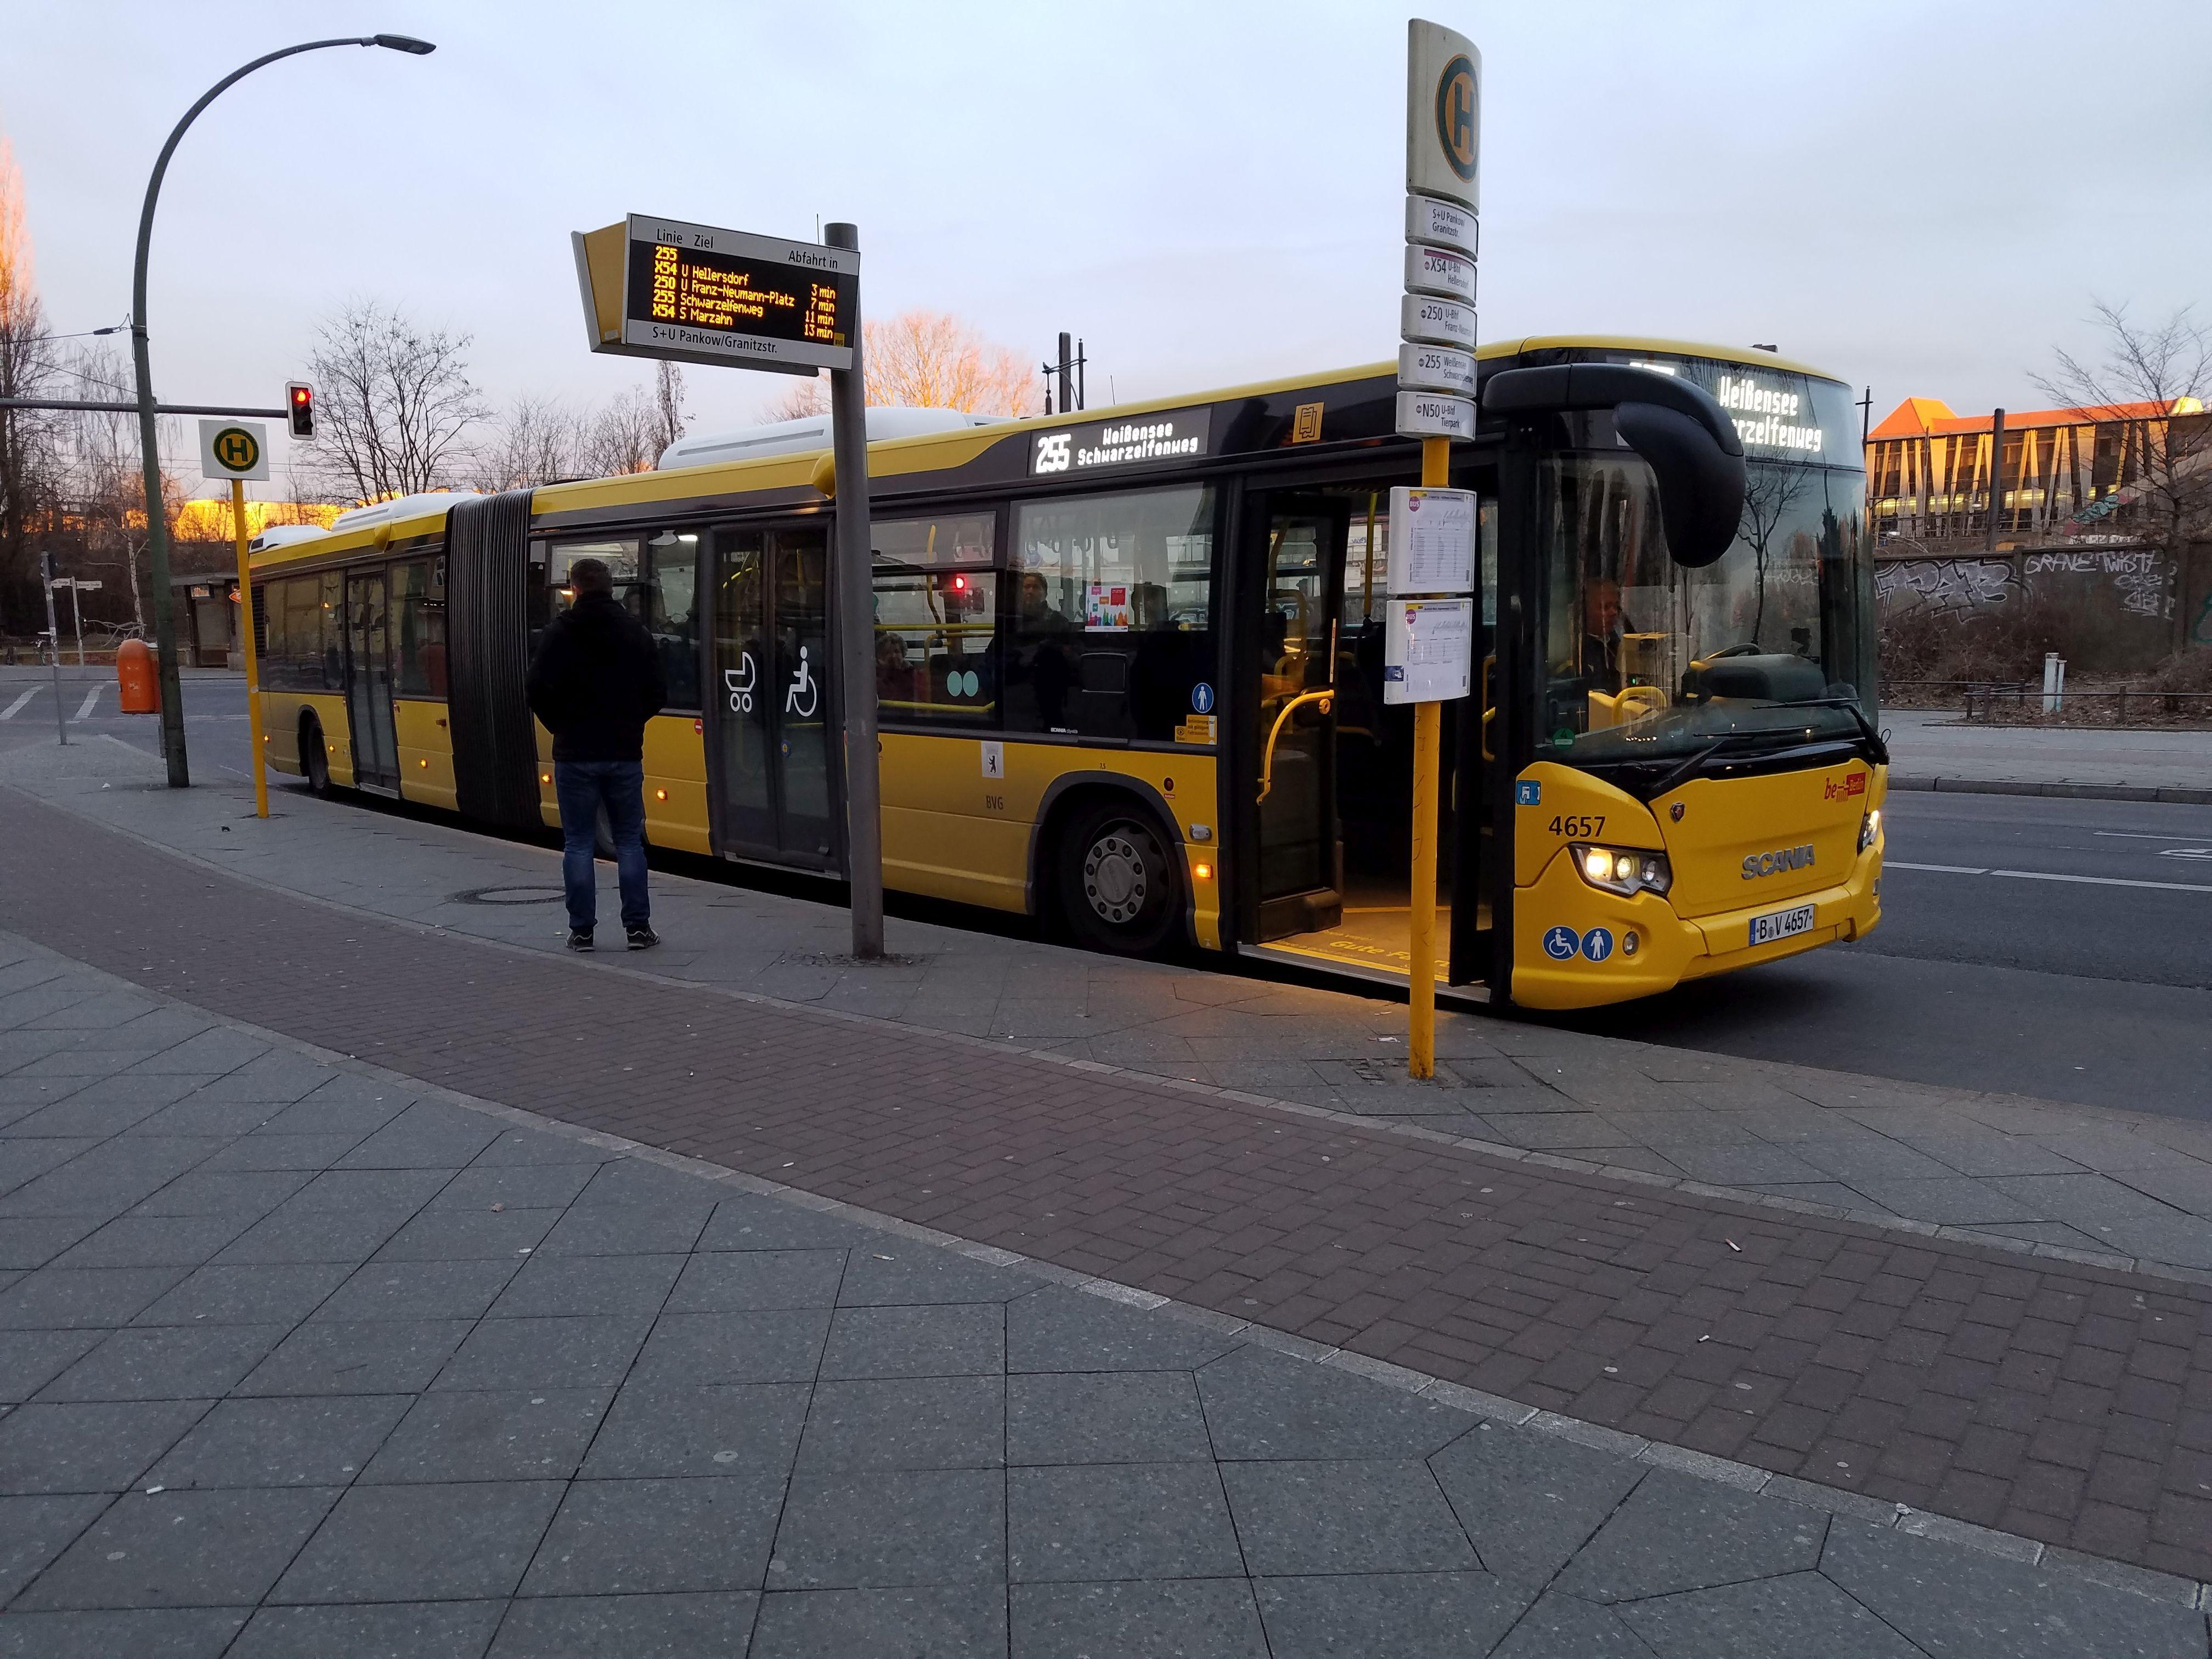 Foto: Bus 4657, Gelenkbus Typ Scania Citywide LFA, Berlin-Pankow, März 2018